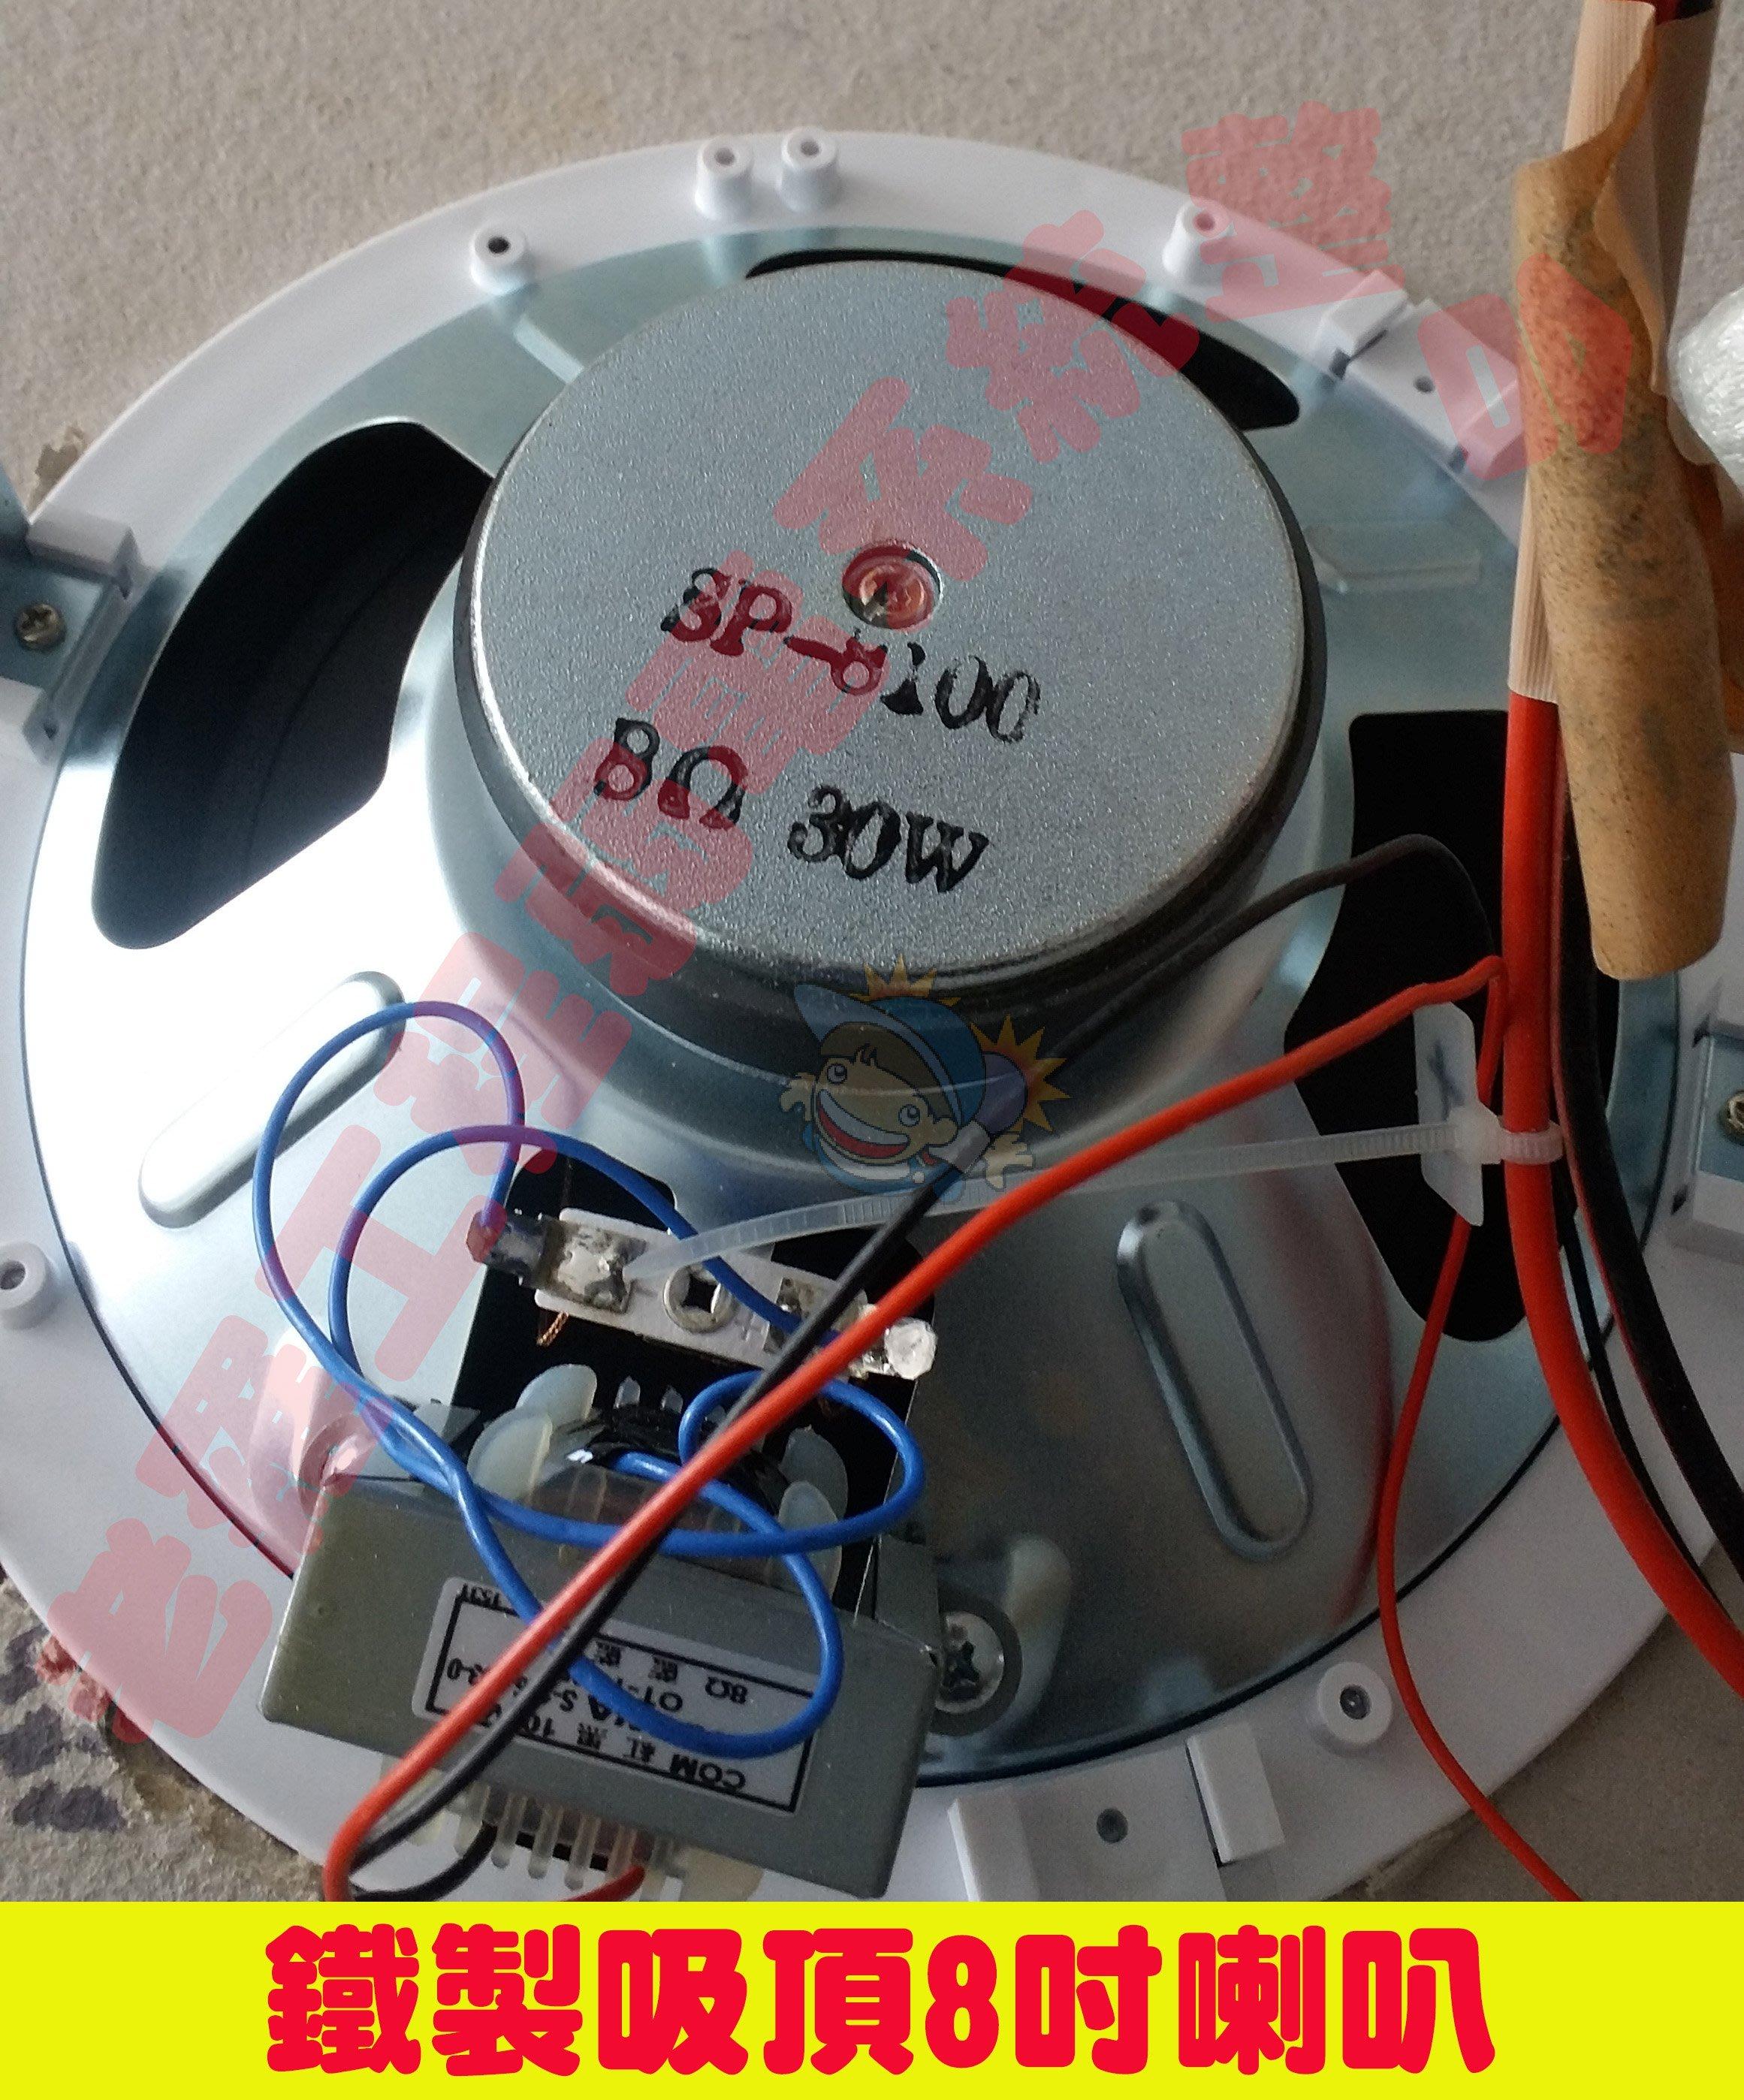 V009*廣播吸頂八吋鐵製喇叭 30W 另~4.8.16分區擴大機 廣播系統 學校幼稚園 上下課打鐘聲 老羅通訊工程